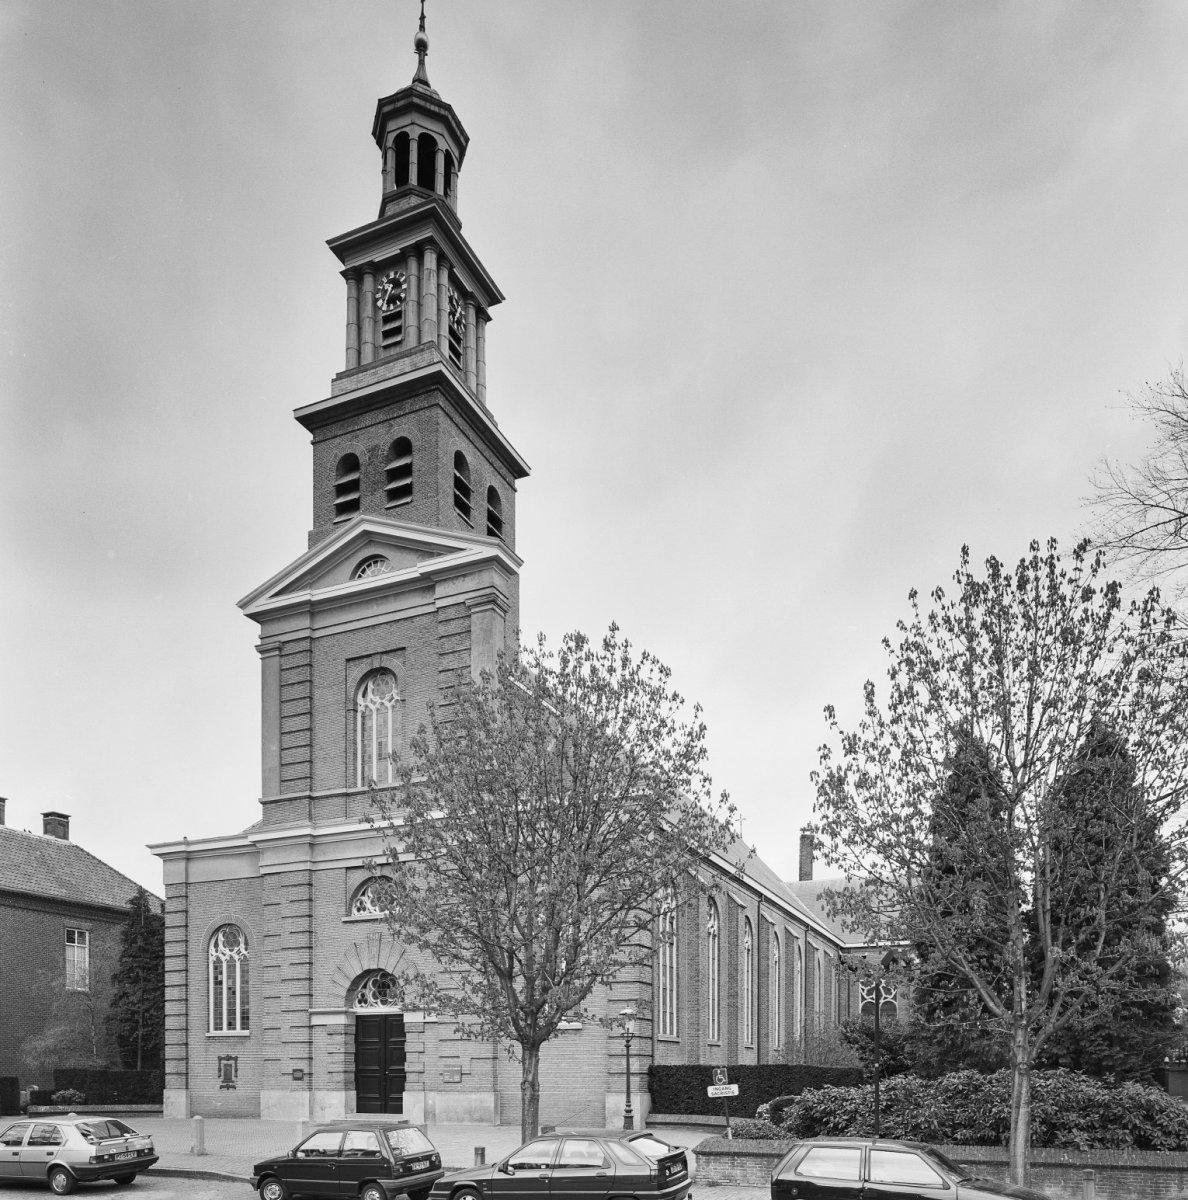 Sint lambertuskerk udenhout wikipedia for Interieur udenhout